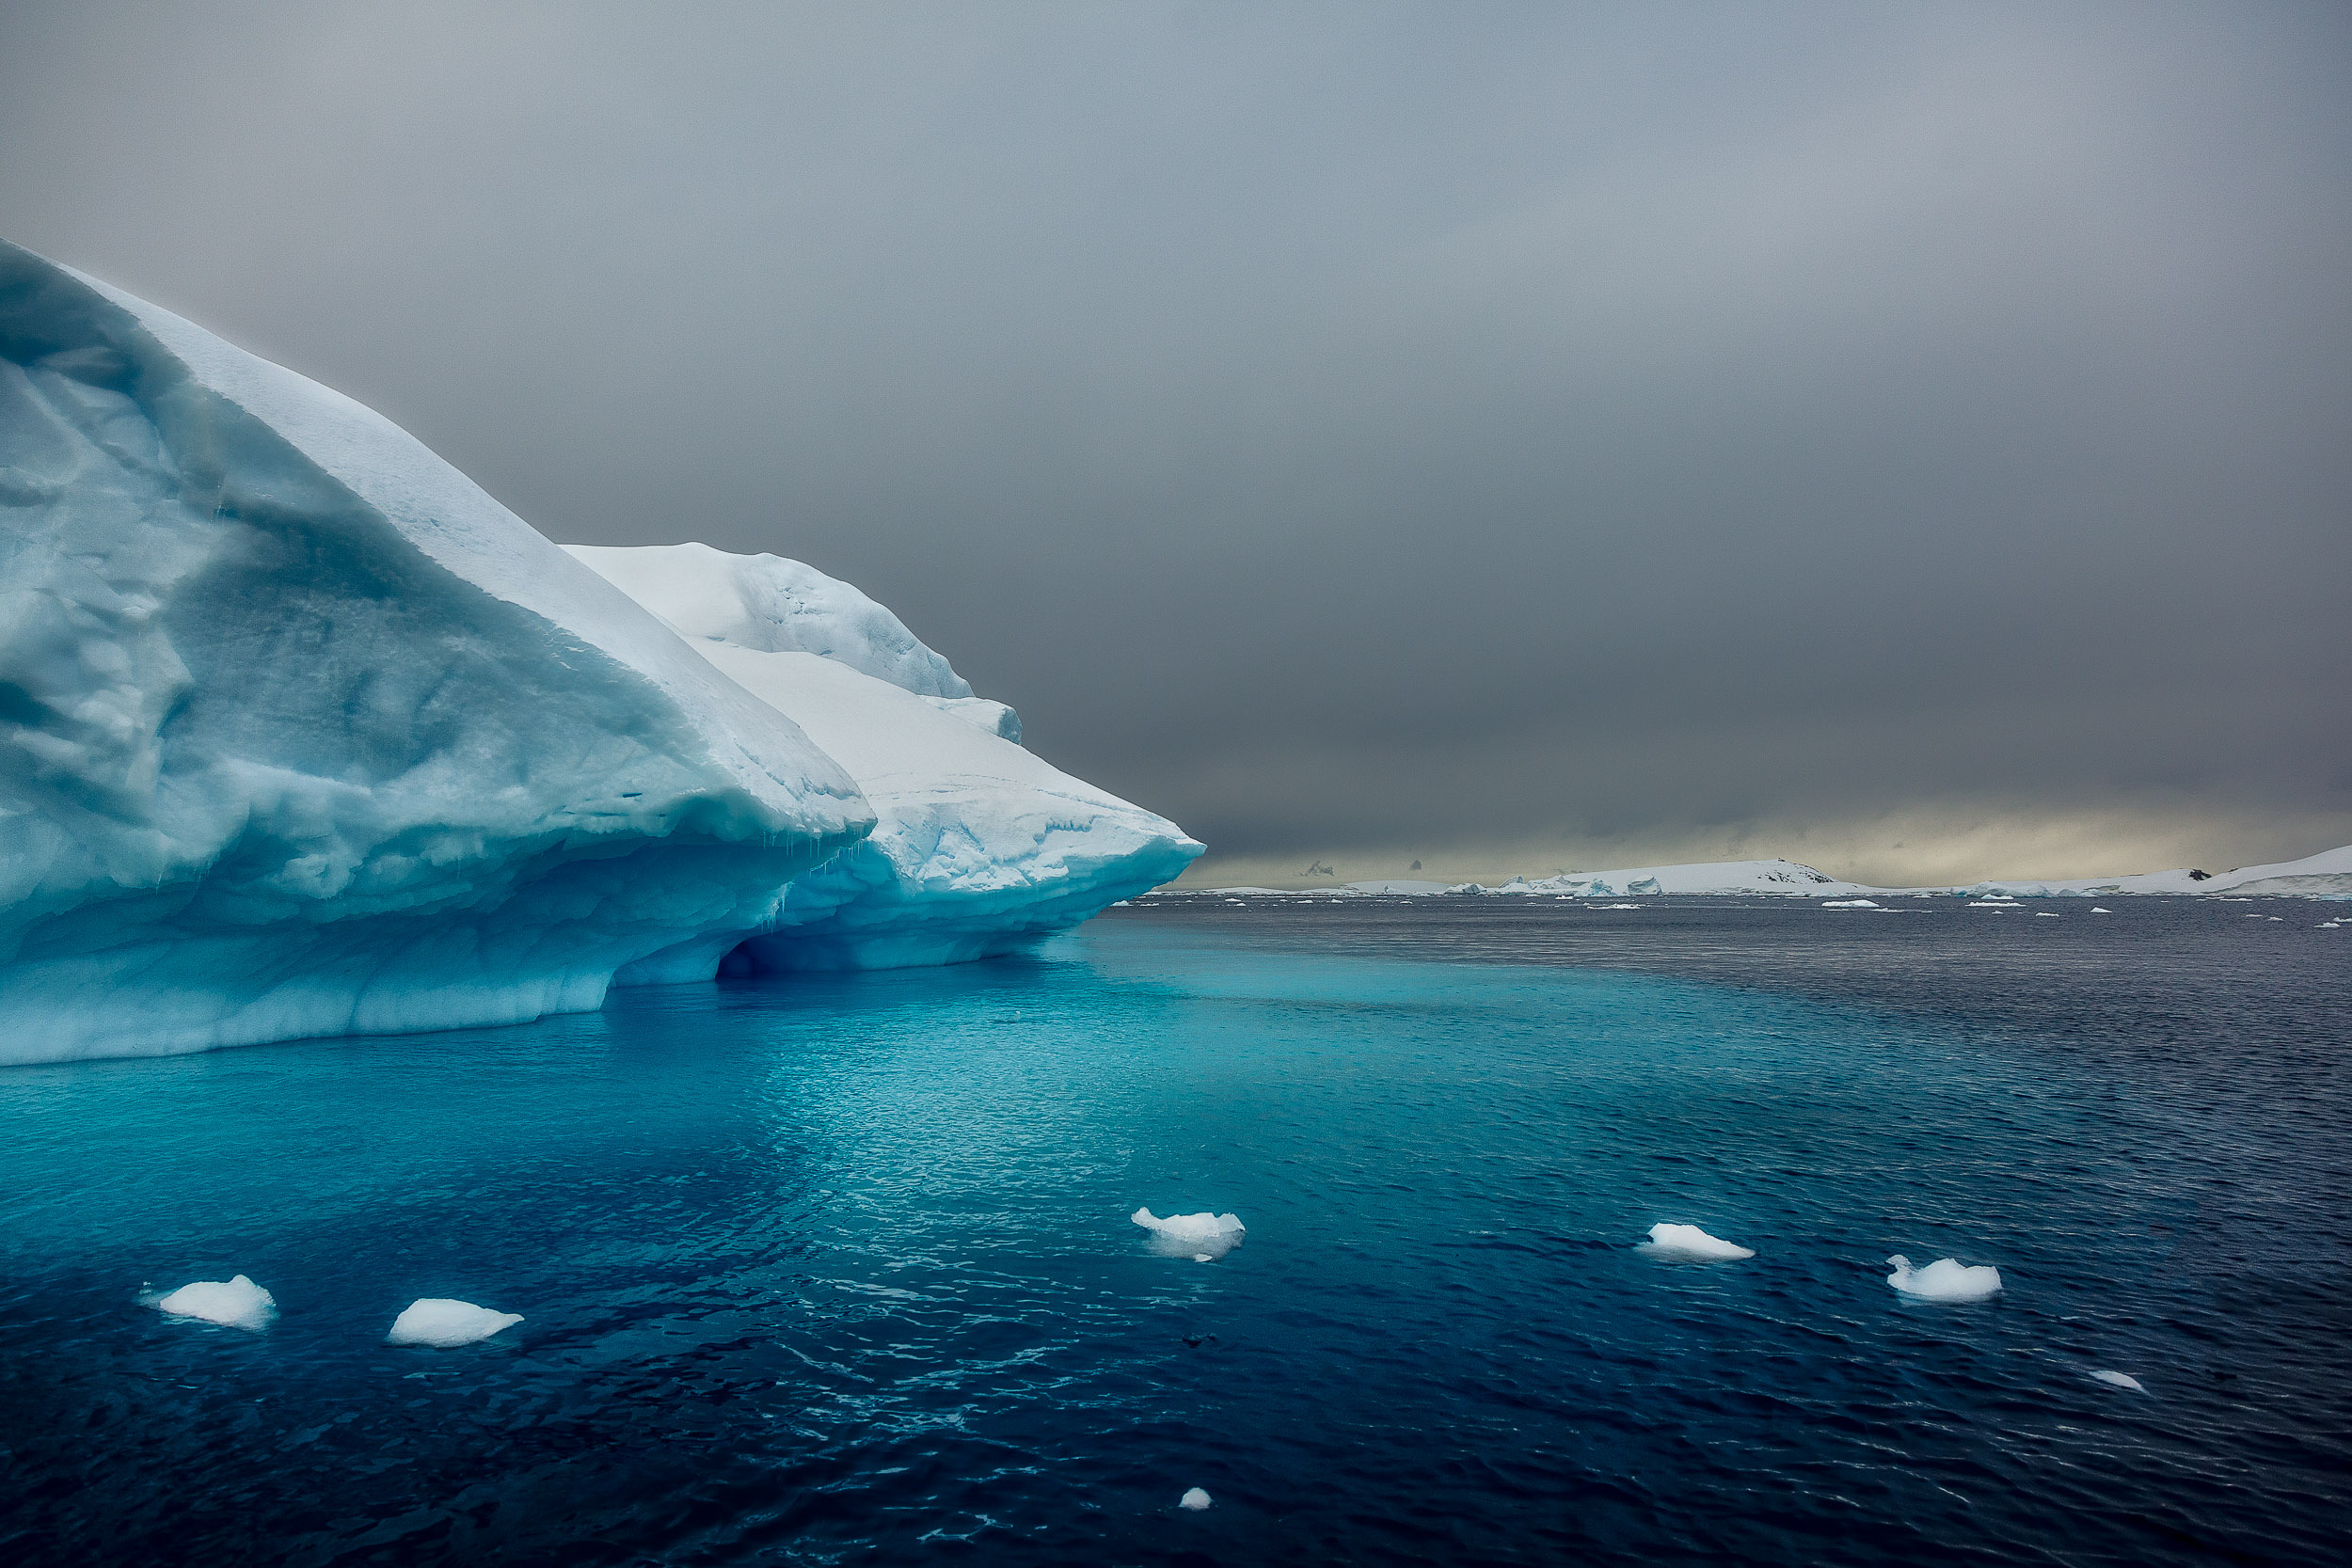 Light illuminates ice    off the coast of    Cuverville Island    in    Antarctica   .